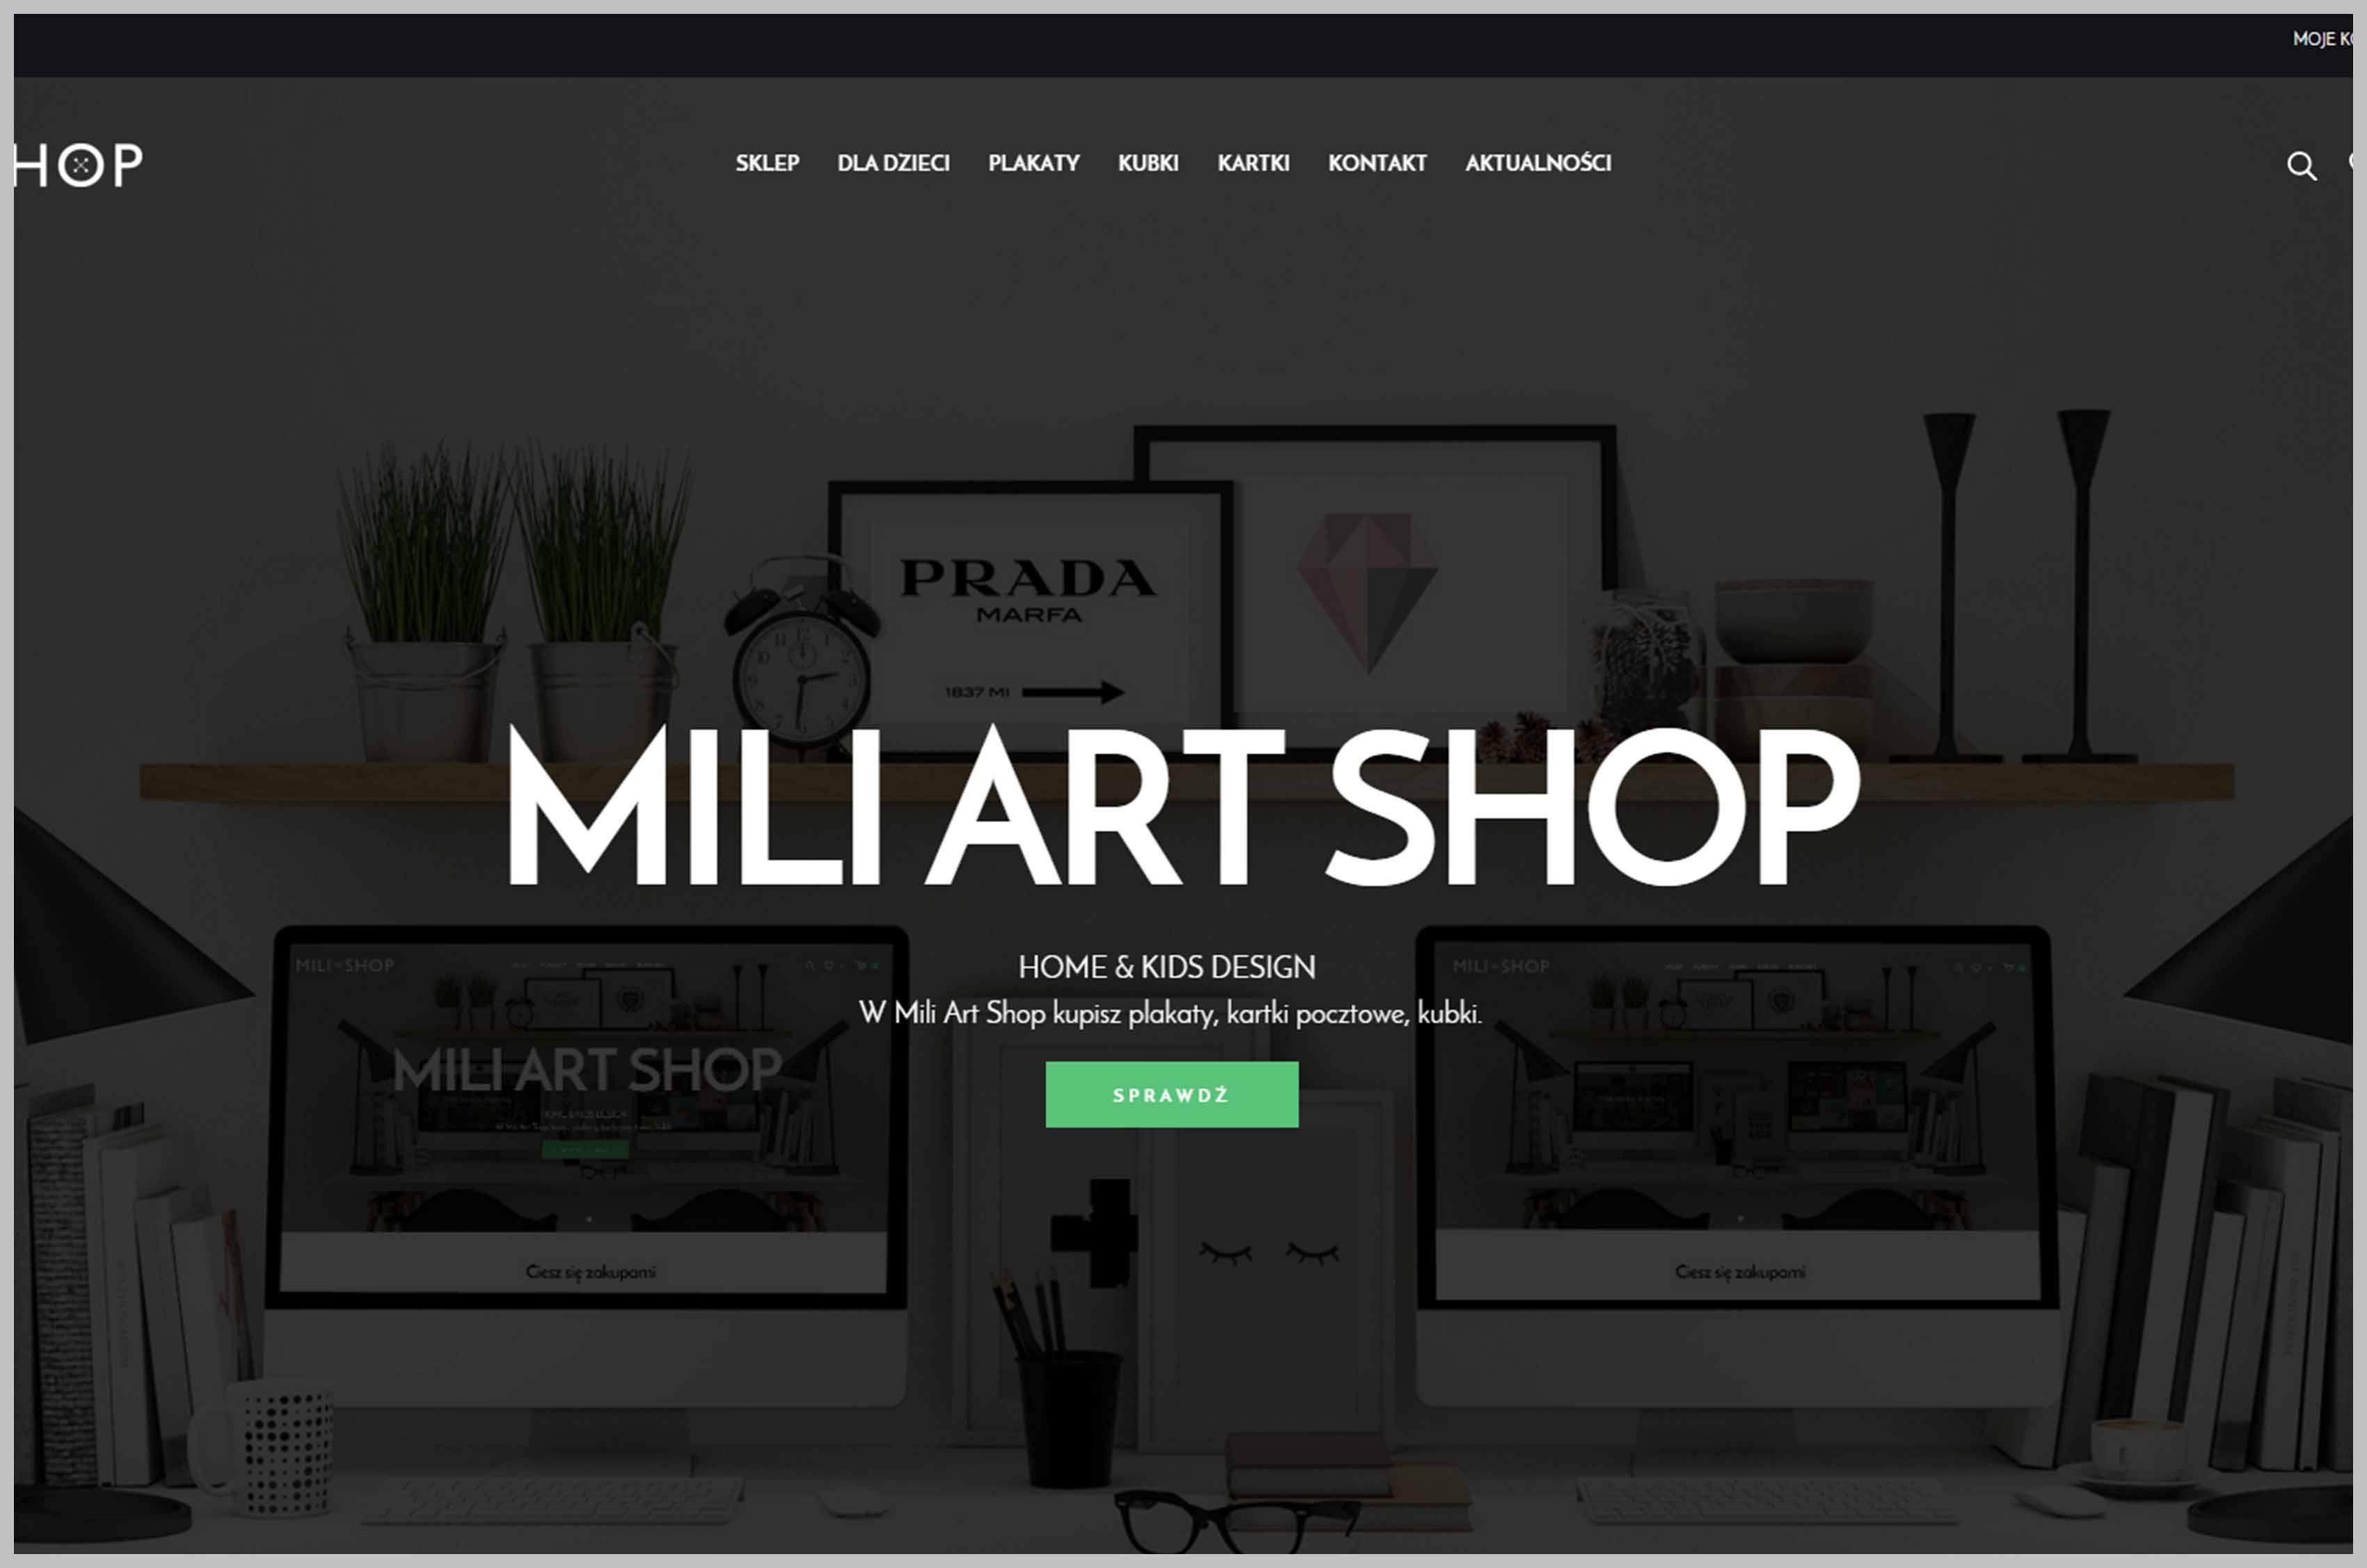 mili art shop